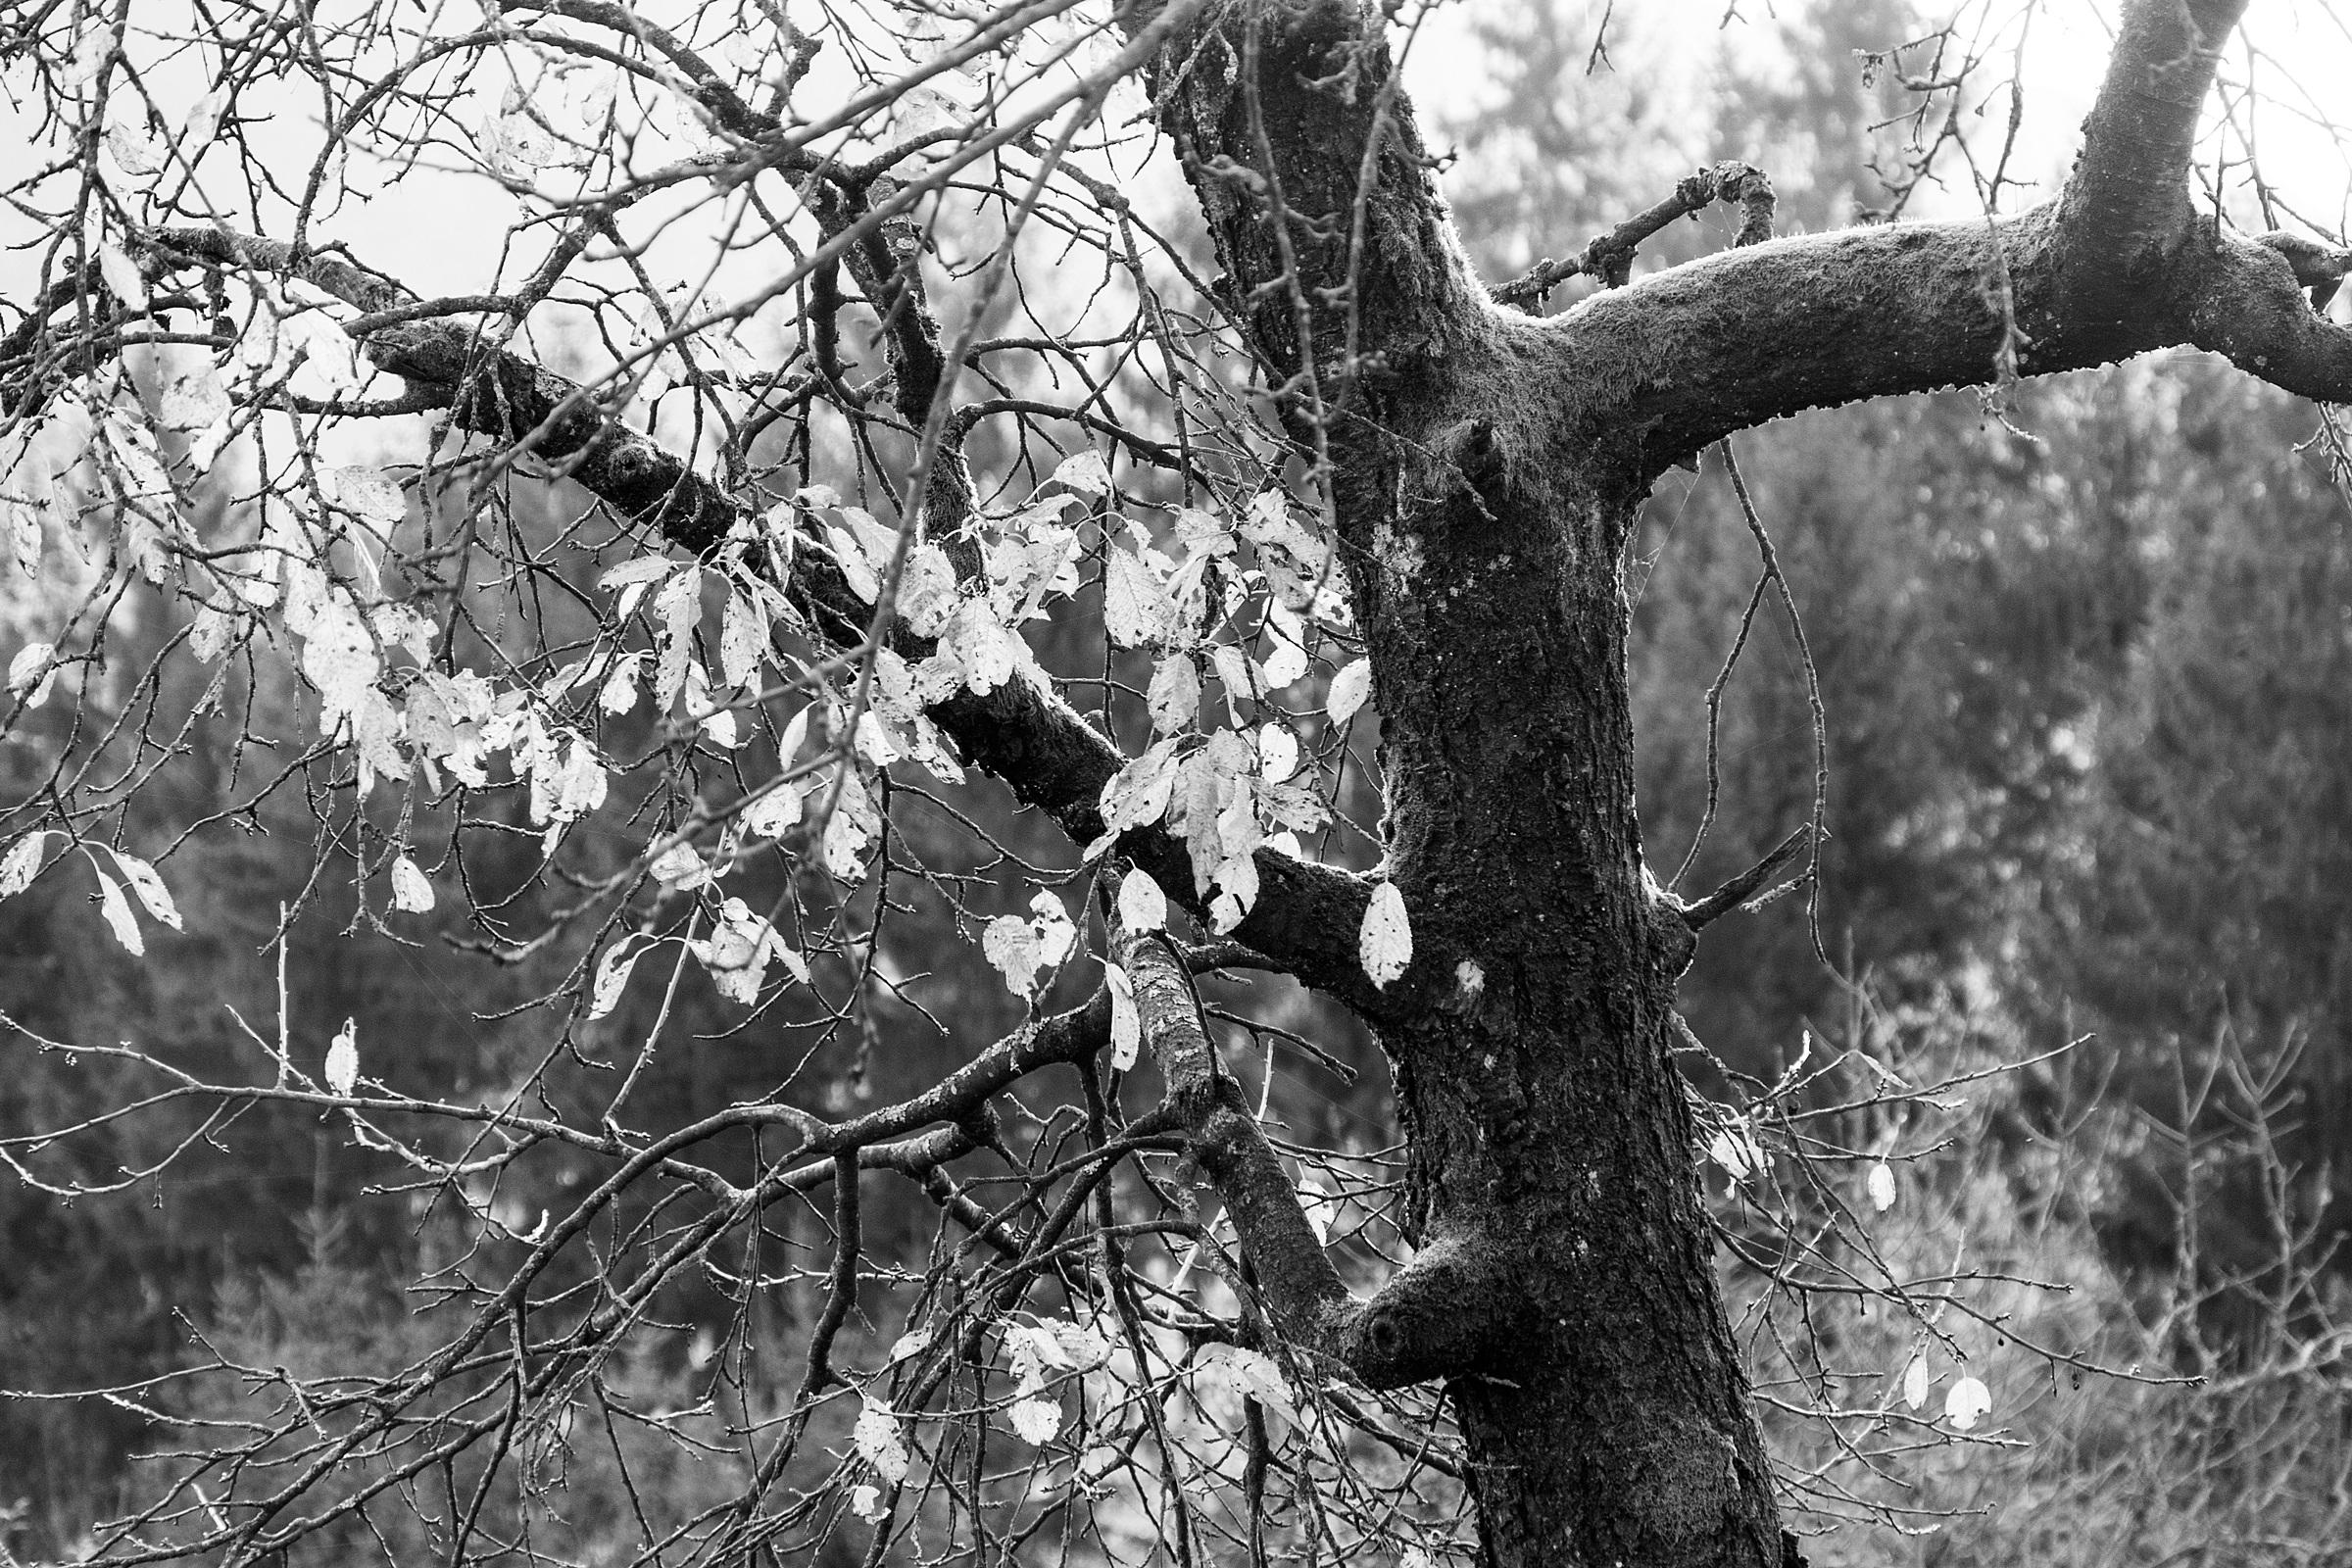 Fotos gratis : árbol, naturaleza, bosque, rama, invierno, ligero, en ...